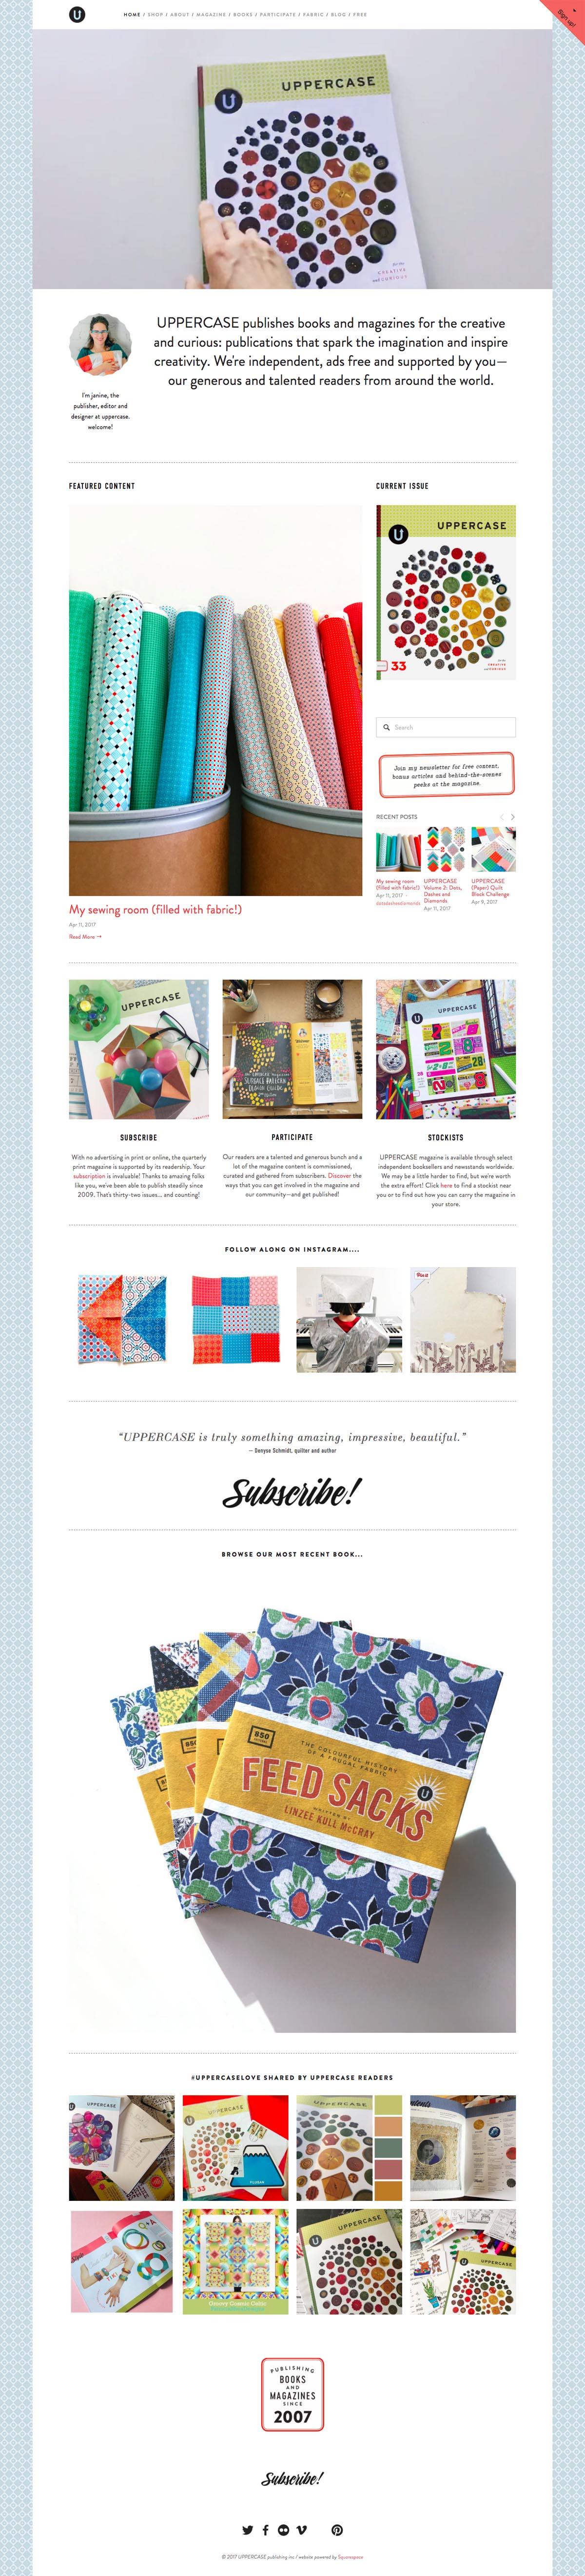 eCommerce website: UPPERCASE